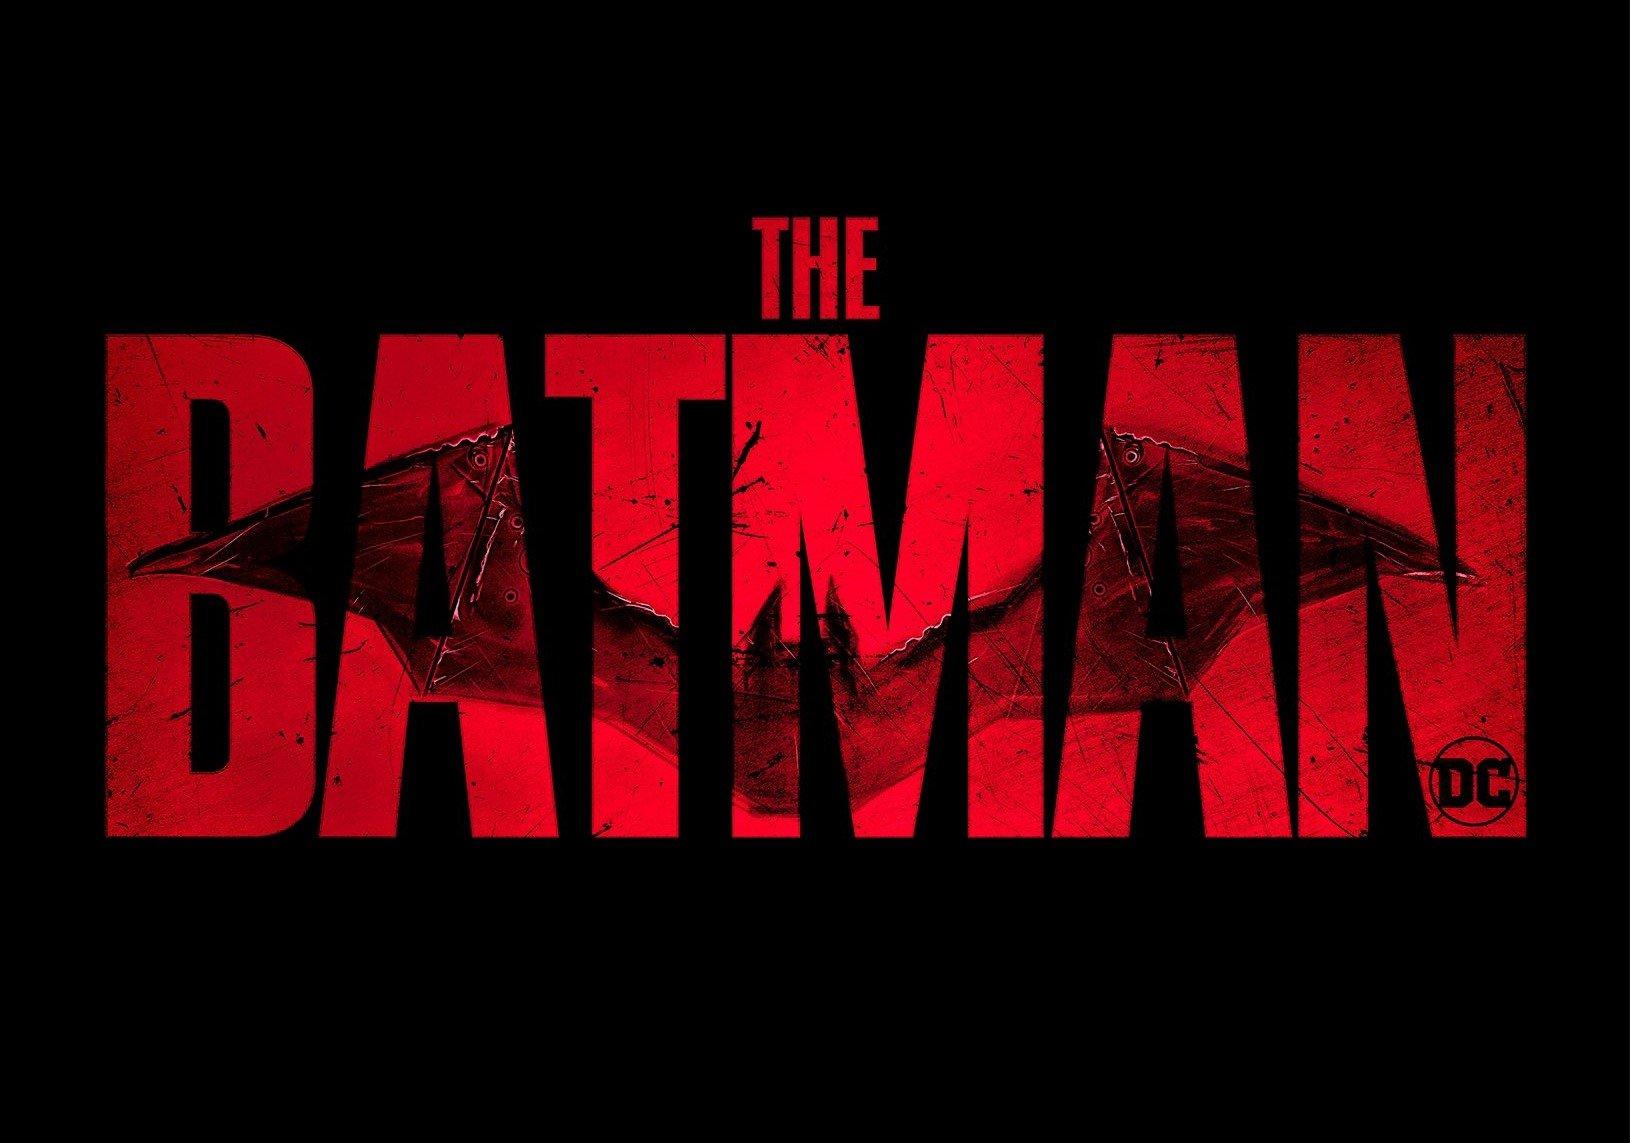 The Batman logo Revealed